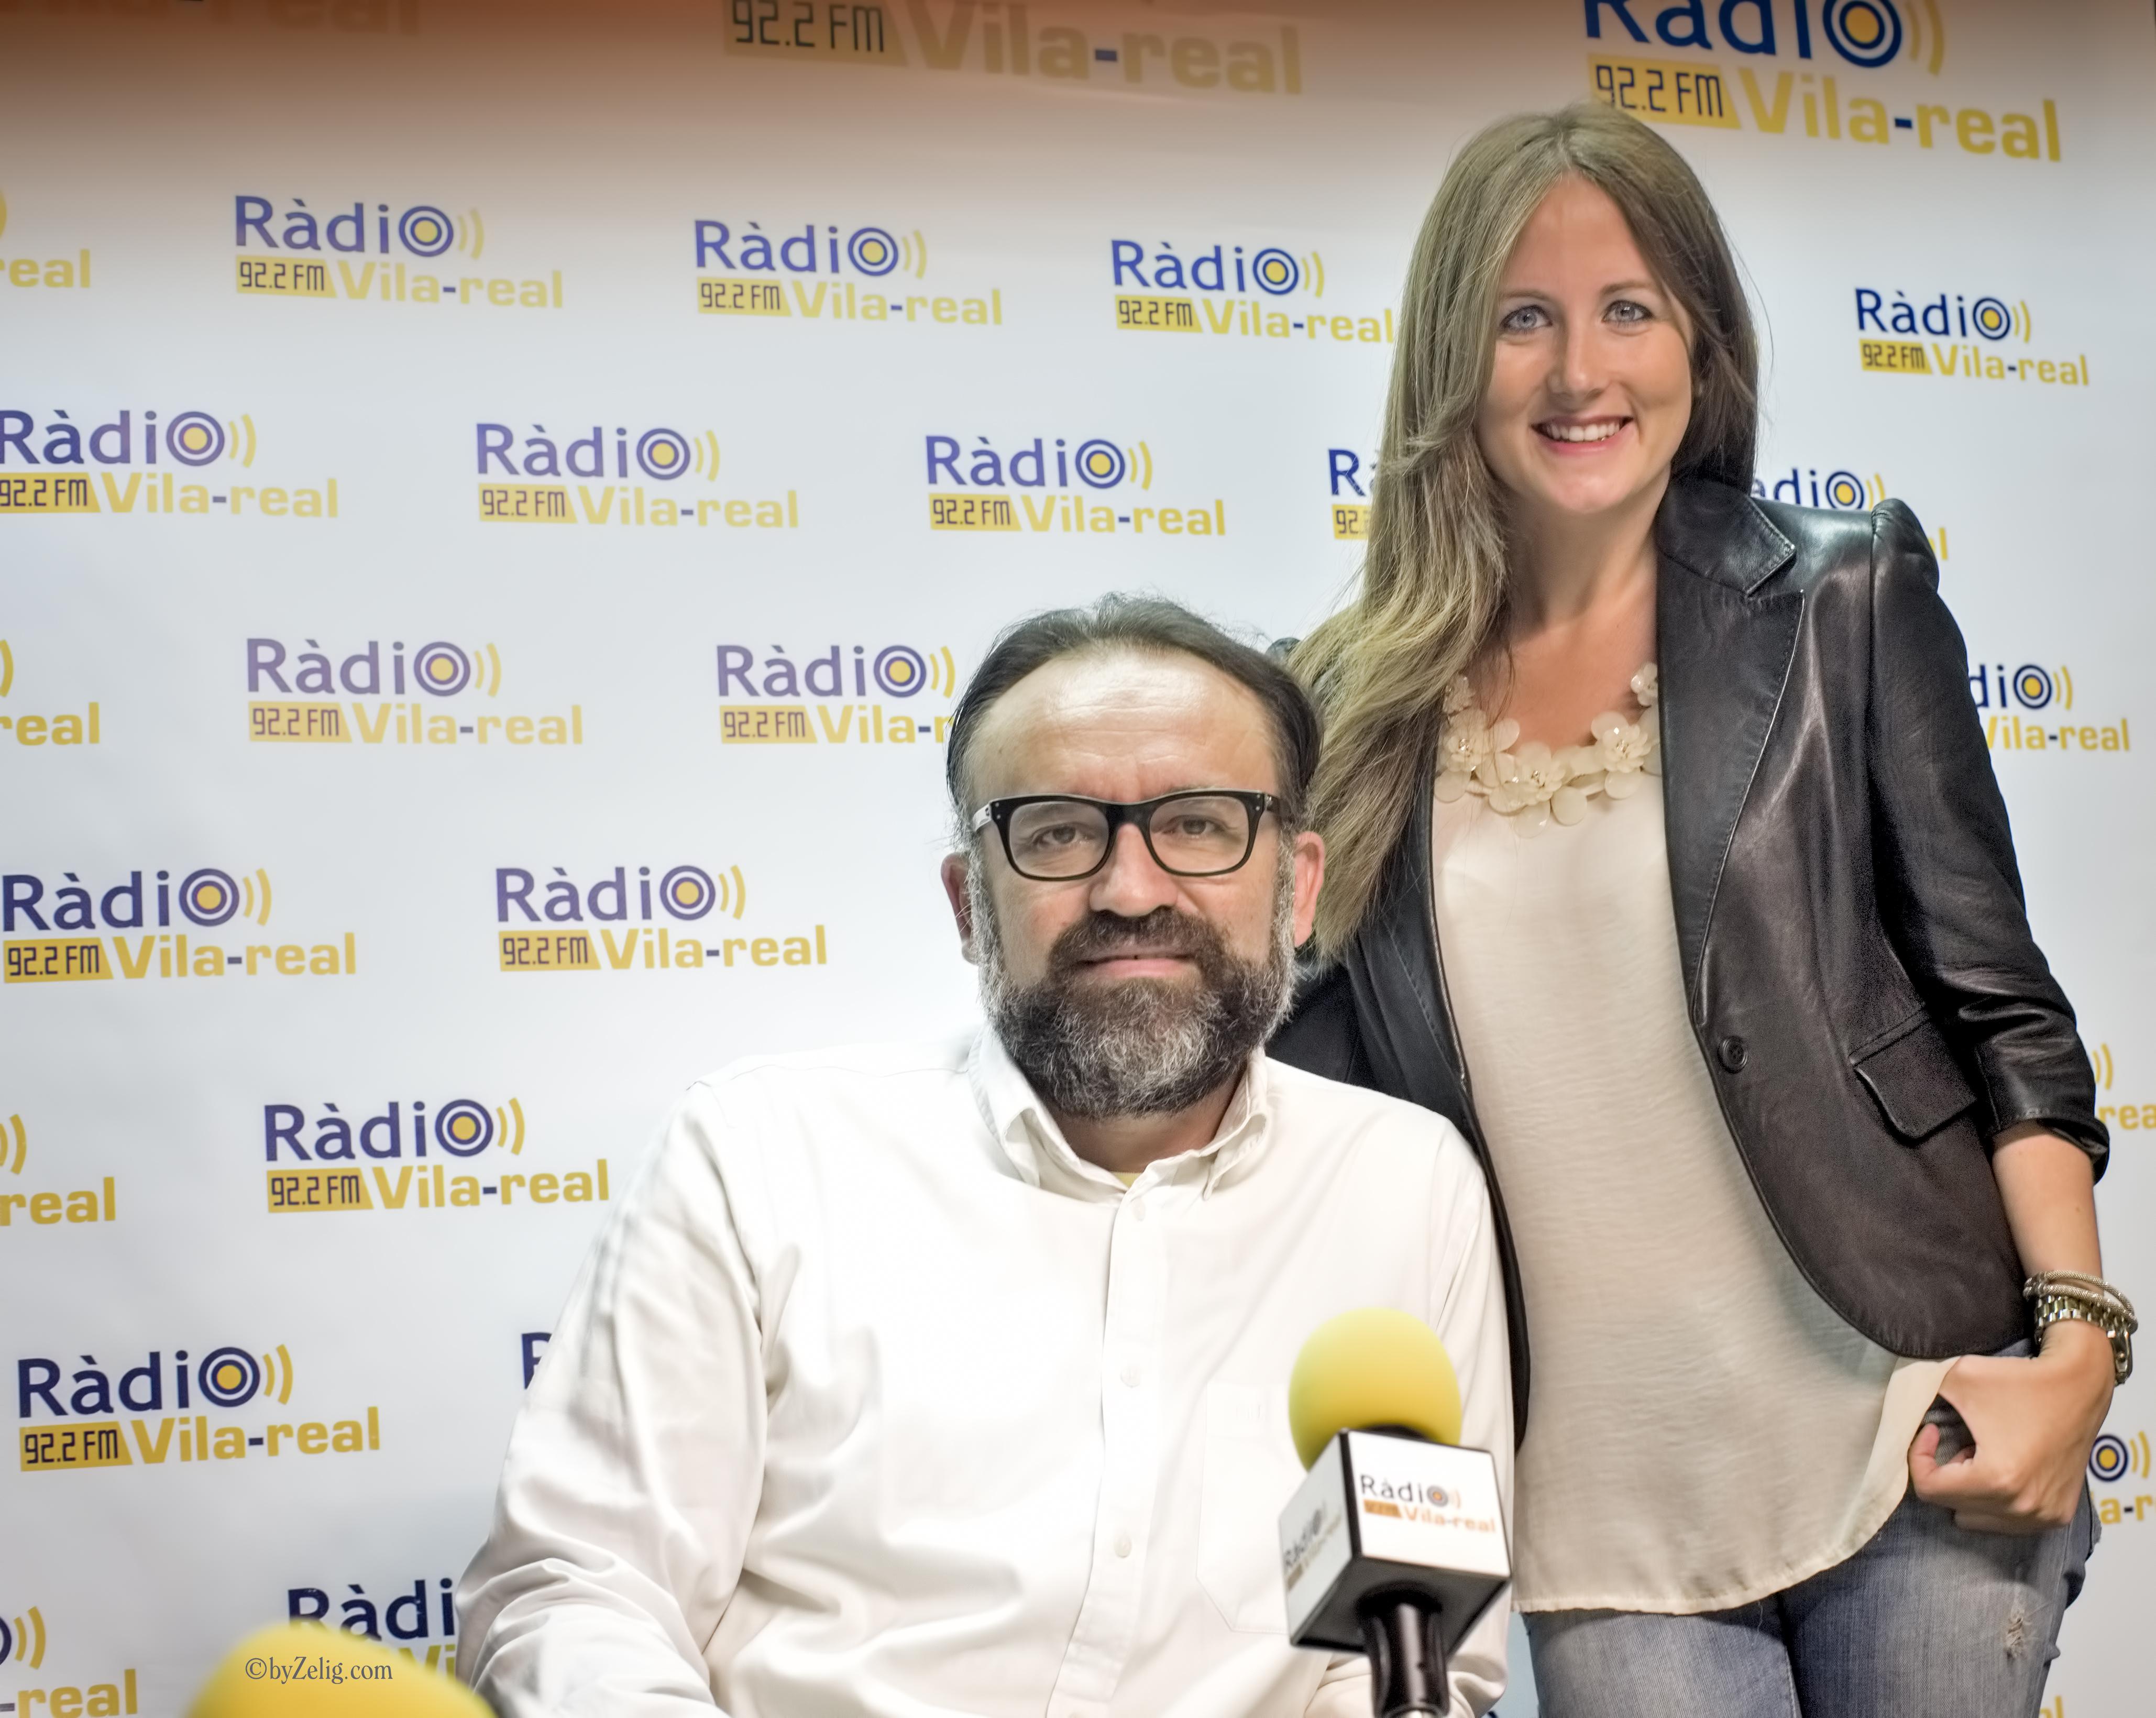 Esports Radio Vila-real. Programa del 21 de febrero de 2017